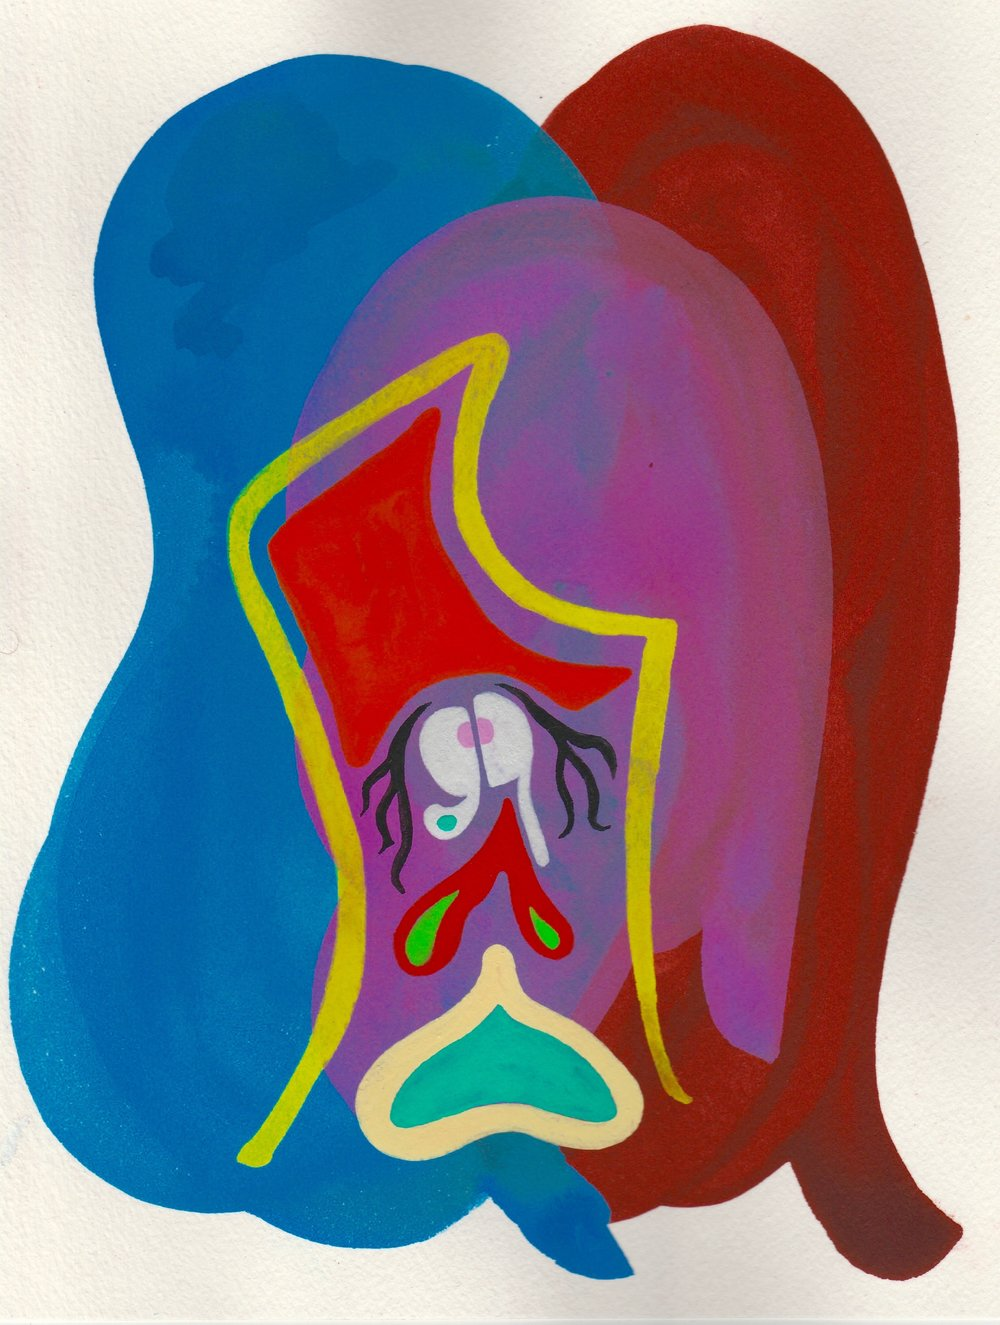 FaceTime #4   2017  Watercolor, Guache  8.5 x 11 inches